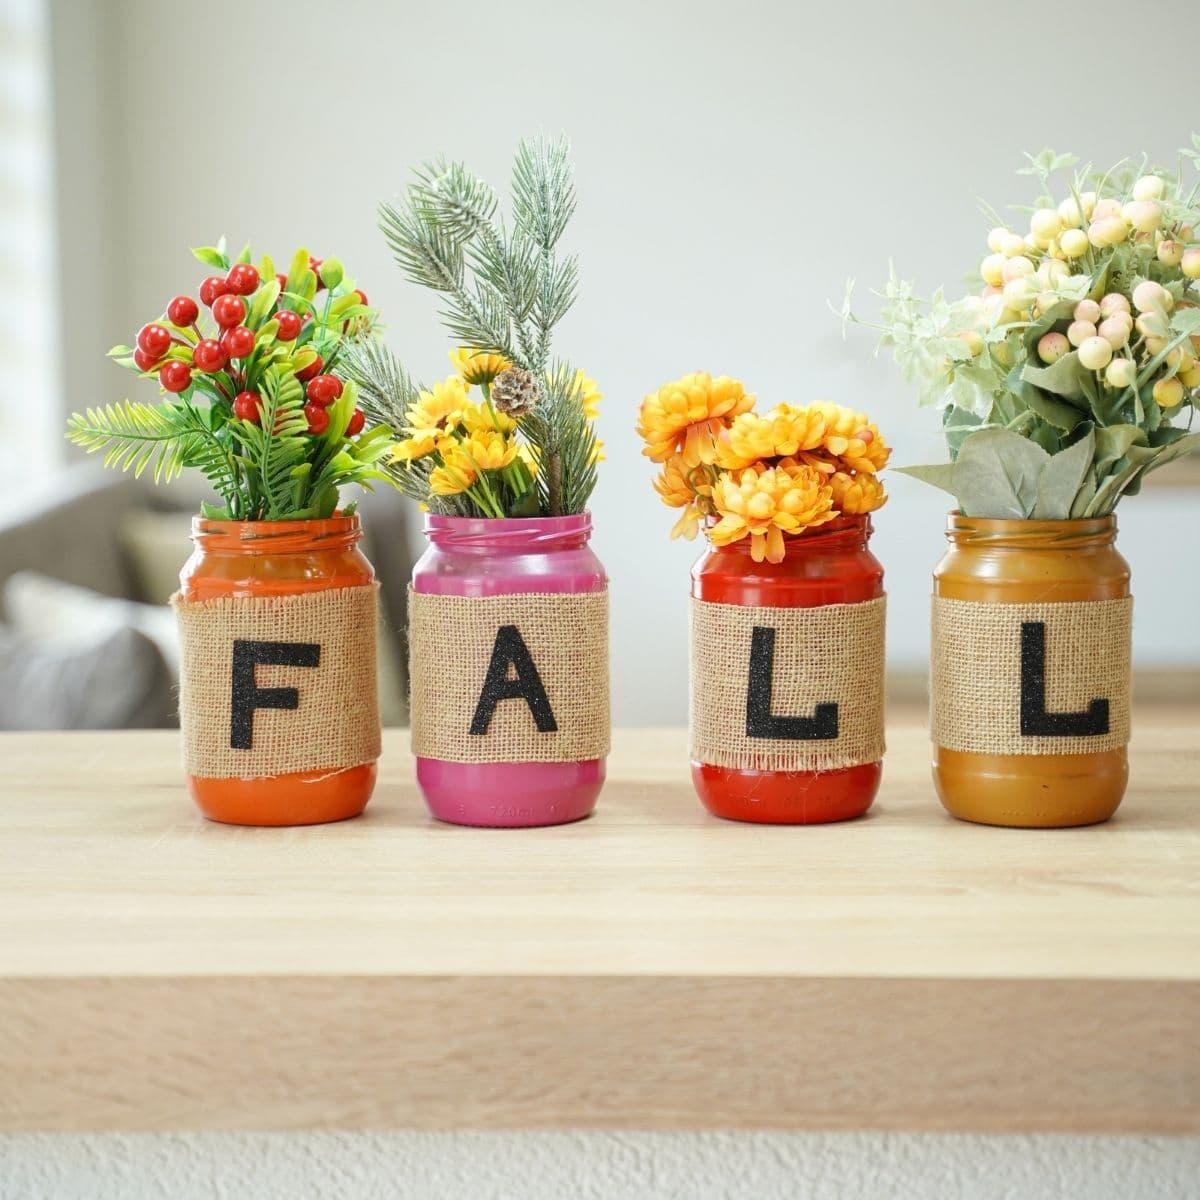 Farmhouse Style Fall Lettered Mason Jar Home Decor Diy Crafts